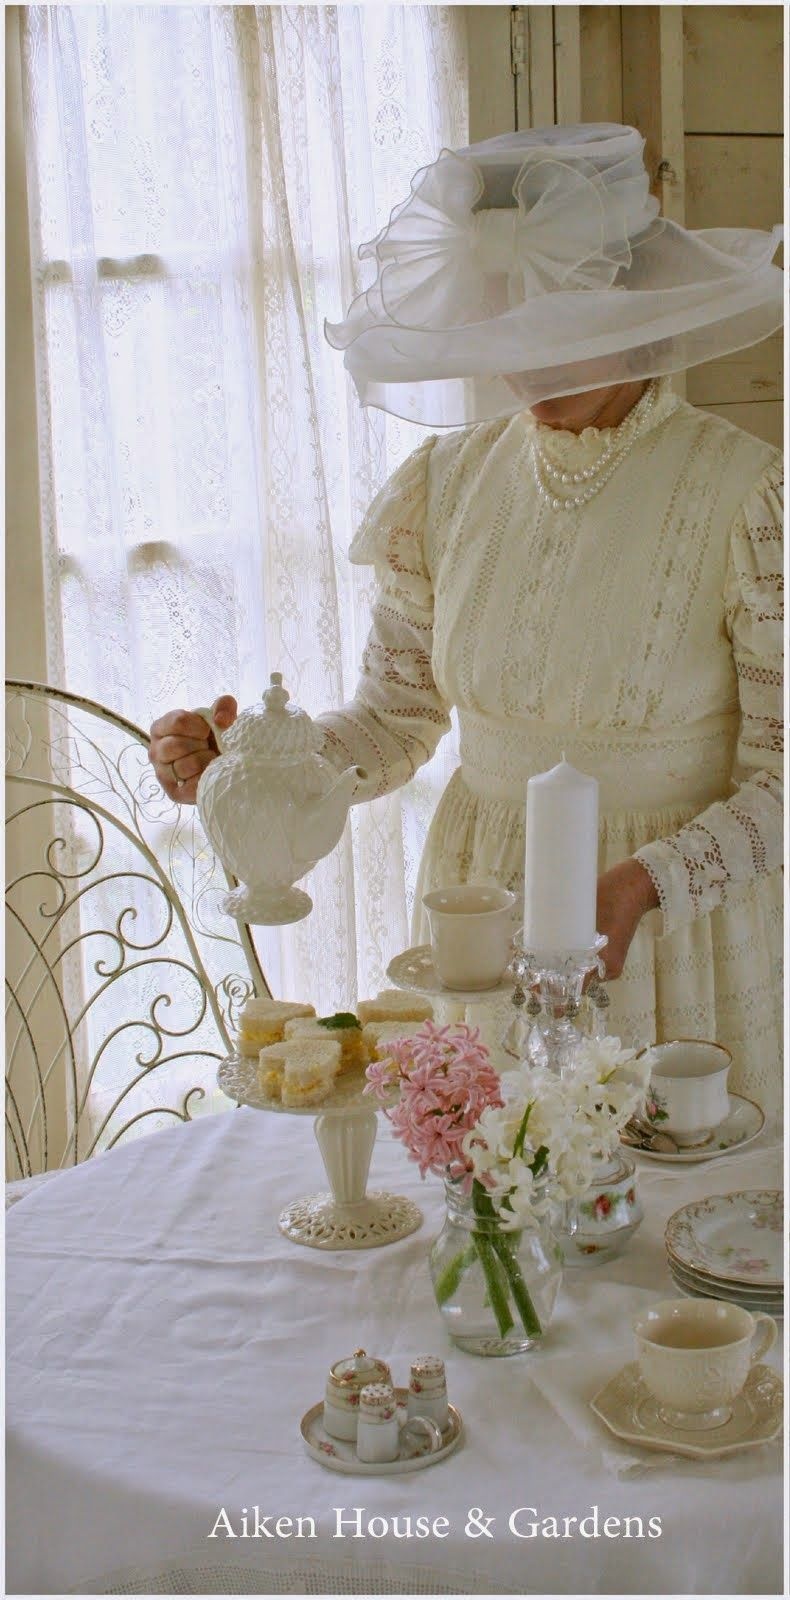 Aiken House Gardens An Upcoming Vintage Tea Tea Time Vintage Tea Tea Party Garden [ 1600 x 790 Pixel ]